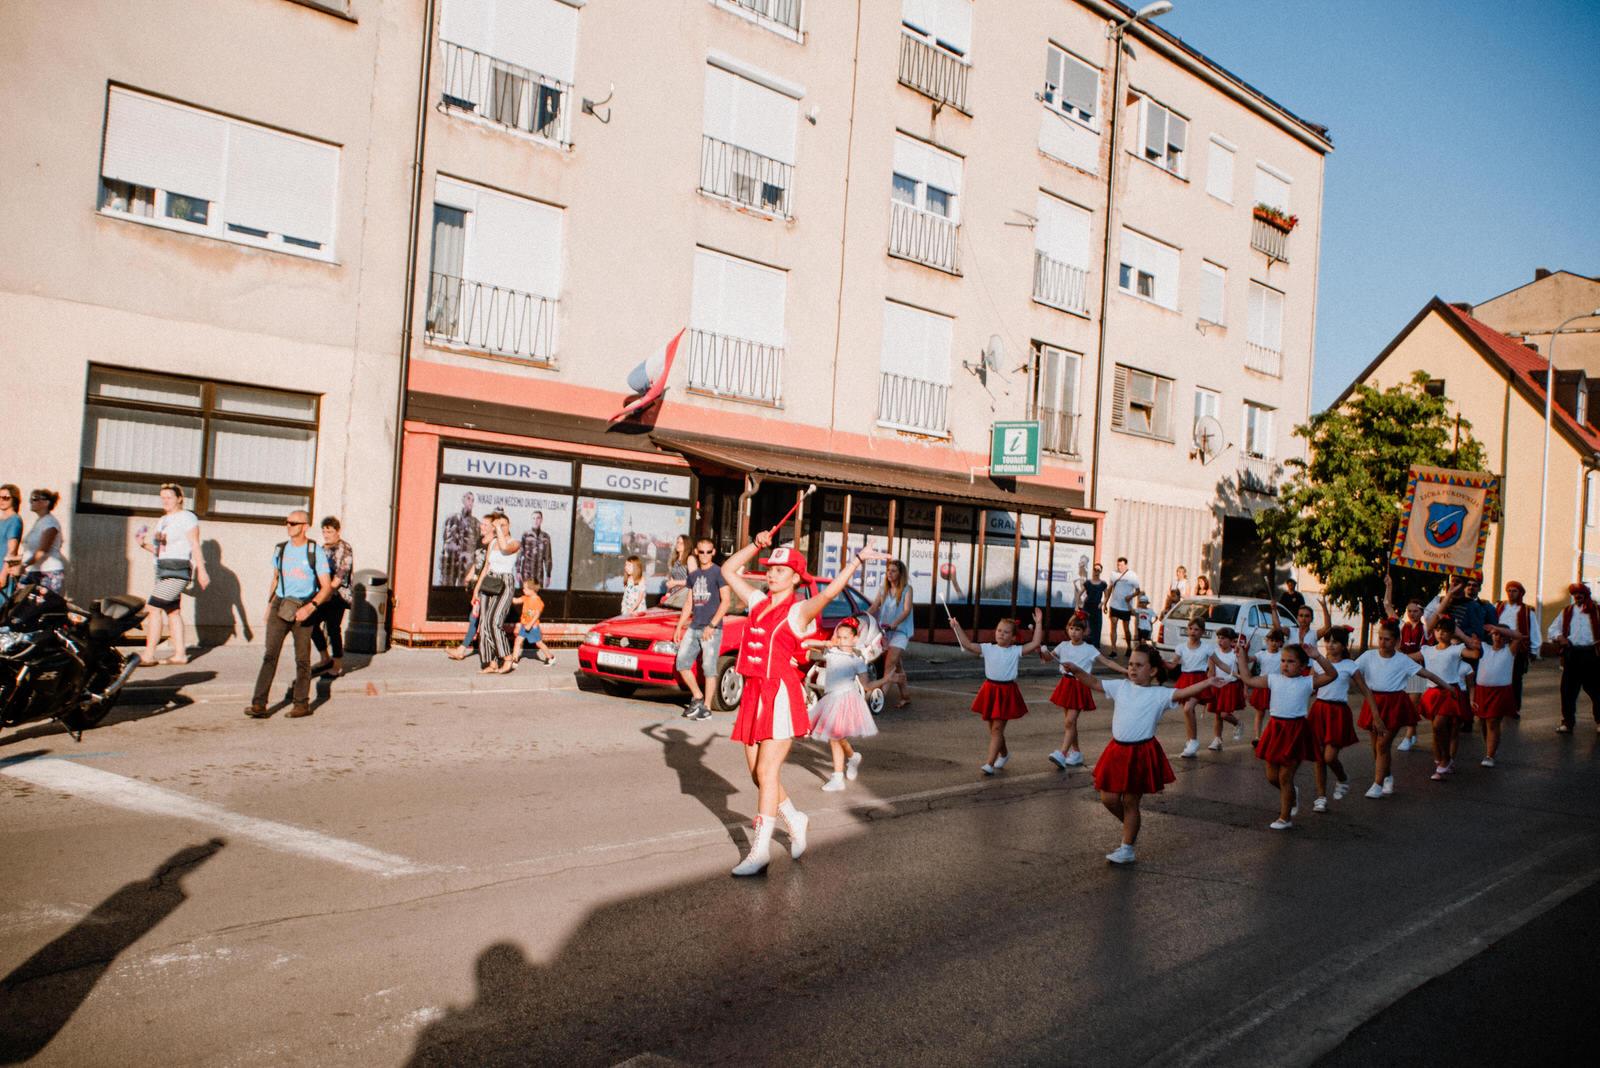 likaclub_dan-Grada-Gospića-2019_1-dan-2